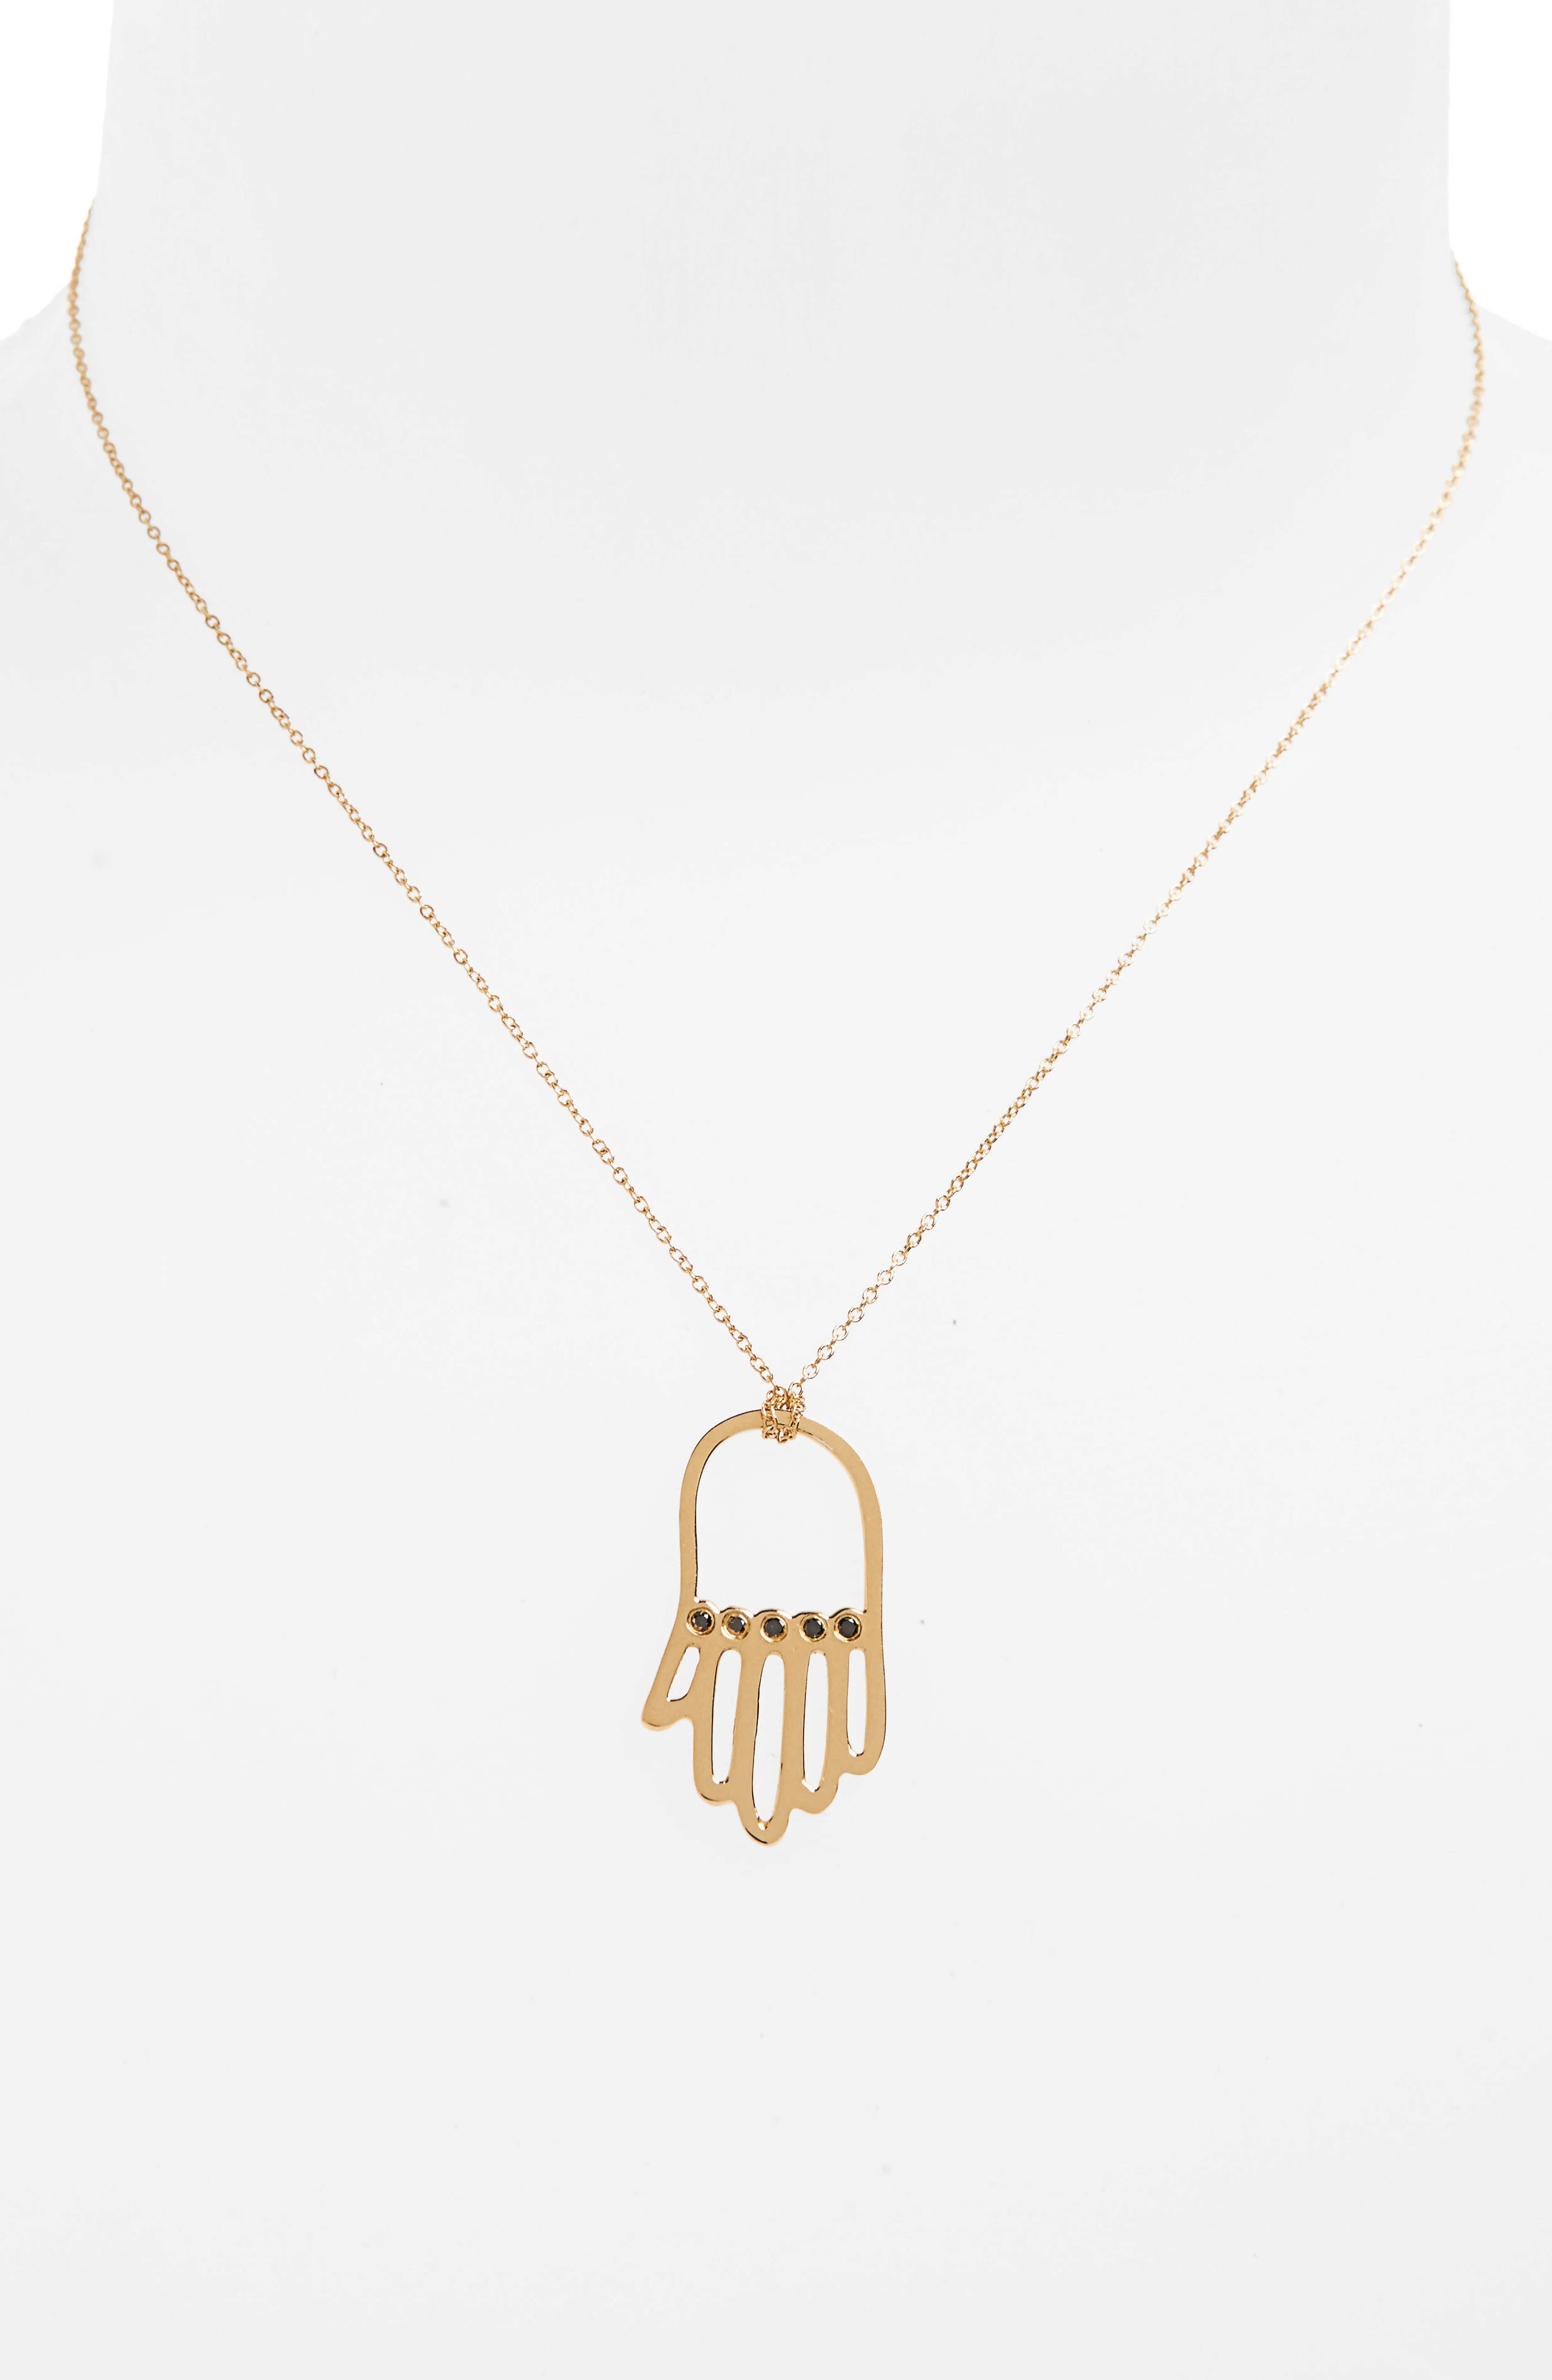 x Rashida Jones Black Diamond Hamsa Pendant Necklace,                             Alternate thumbnail 2, color,                             Yellow Gold